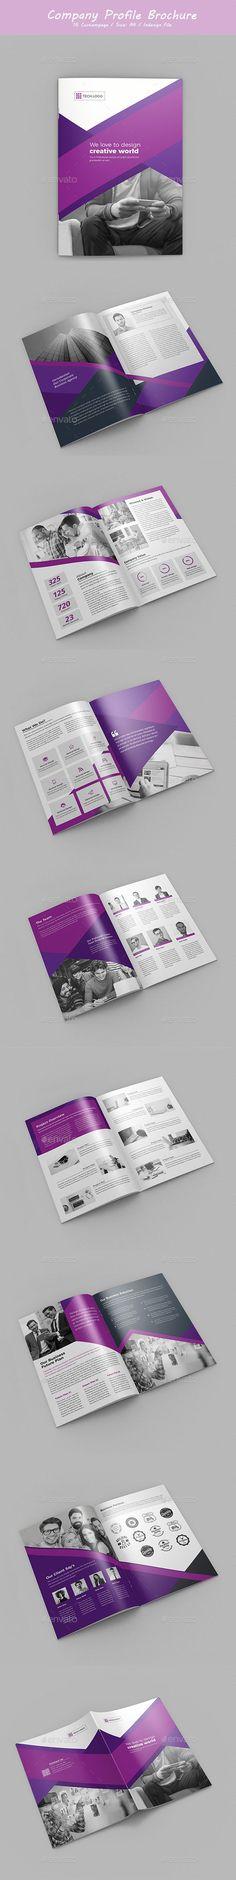 #Company Profile Brochure - #Brochures Print Templates